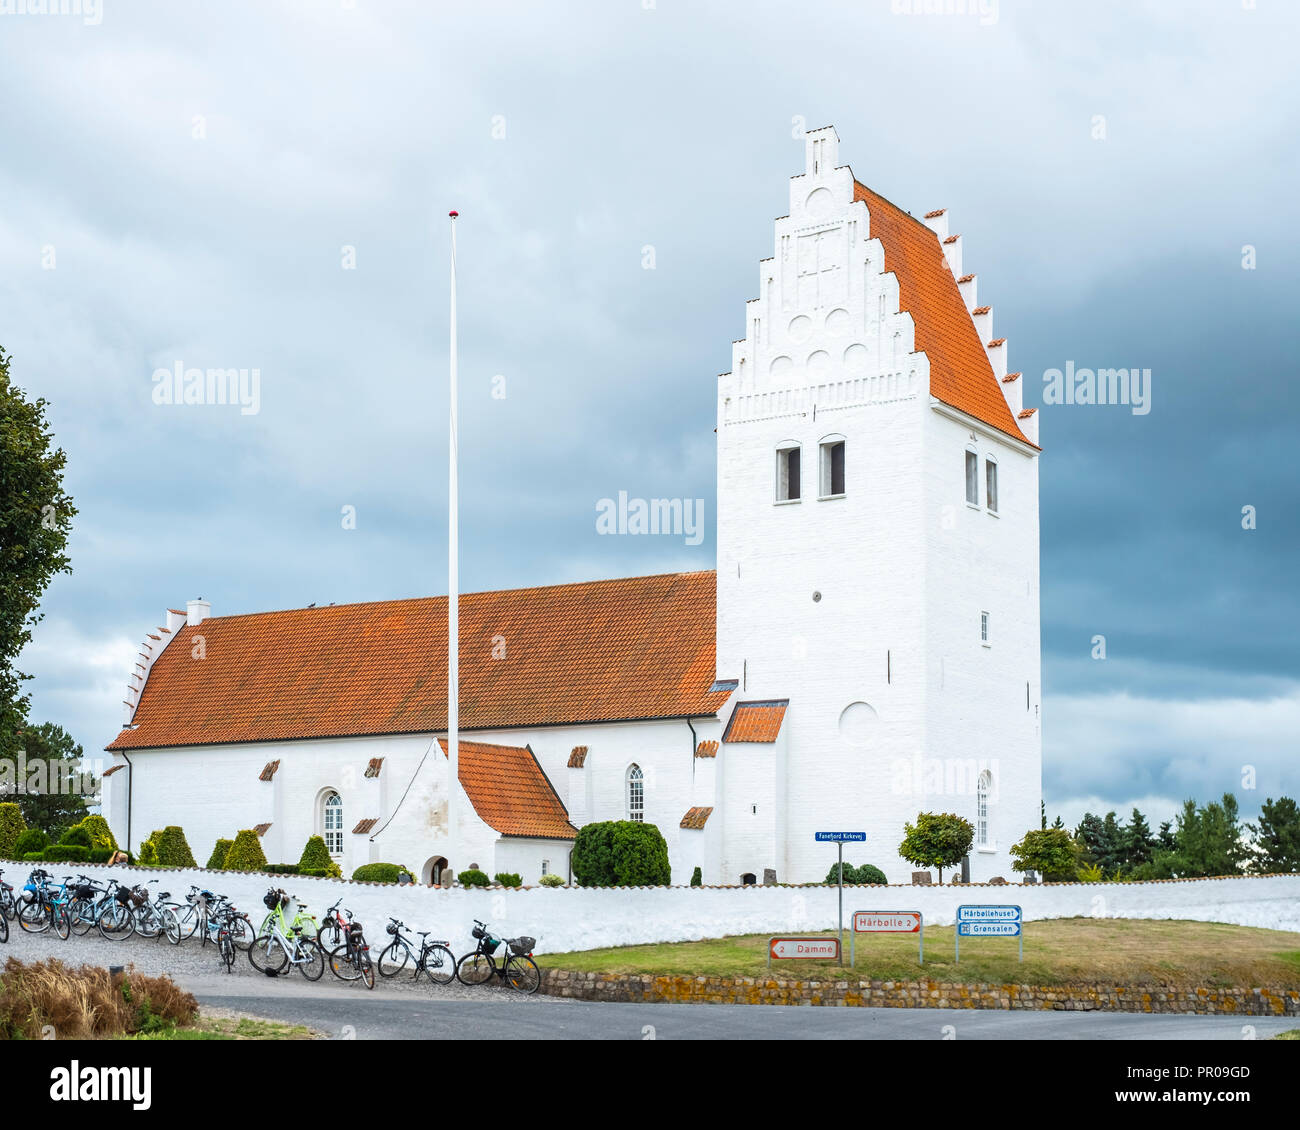 Außenansicht von fanefjord Kirche, Moen Island, Dänemark, Skandinavien, Europa. Stockbild